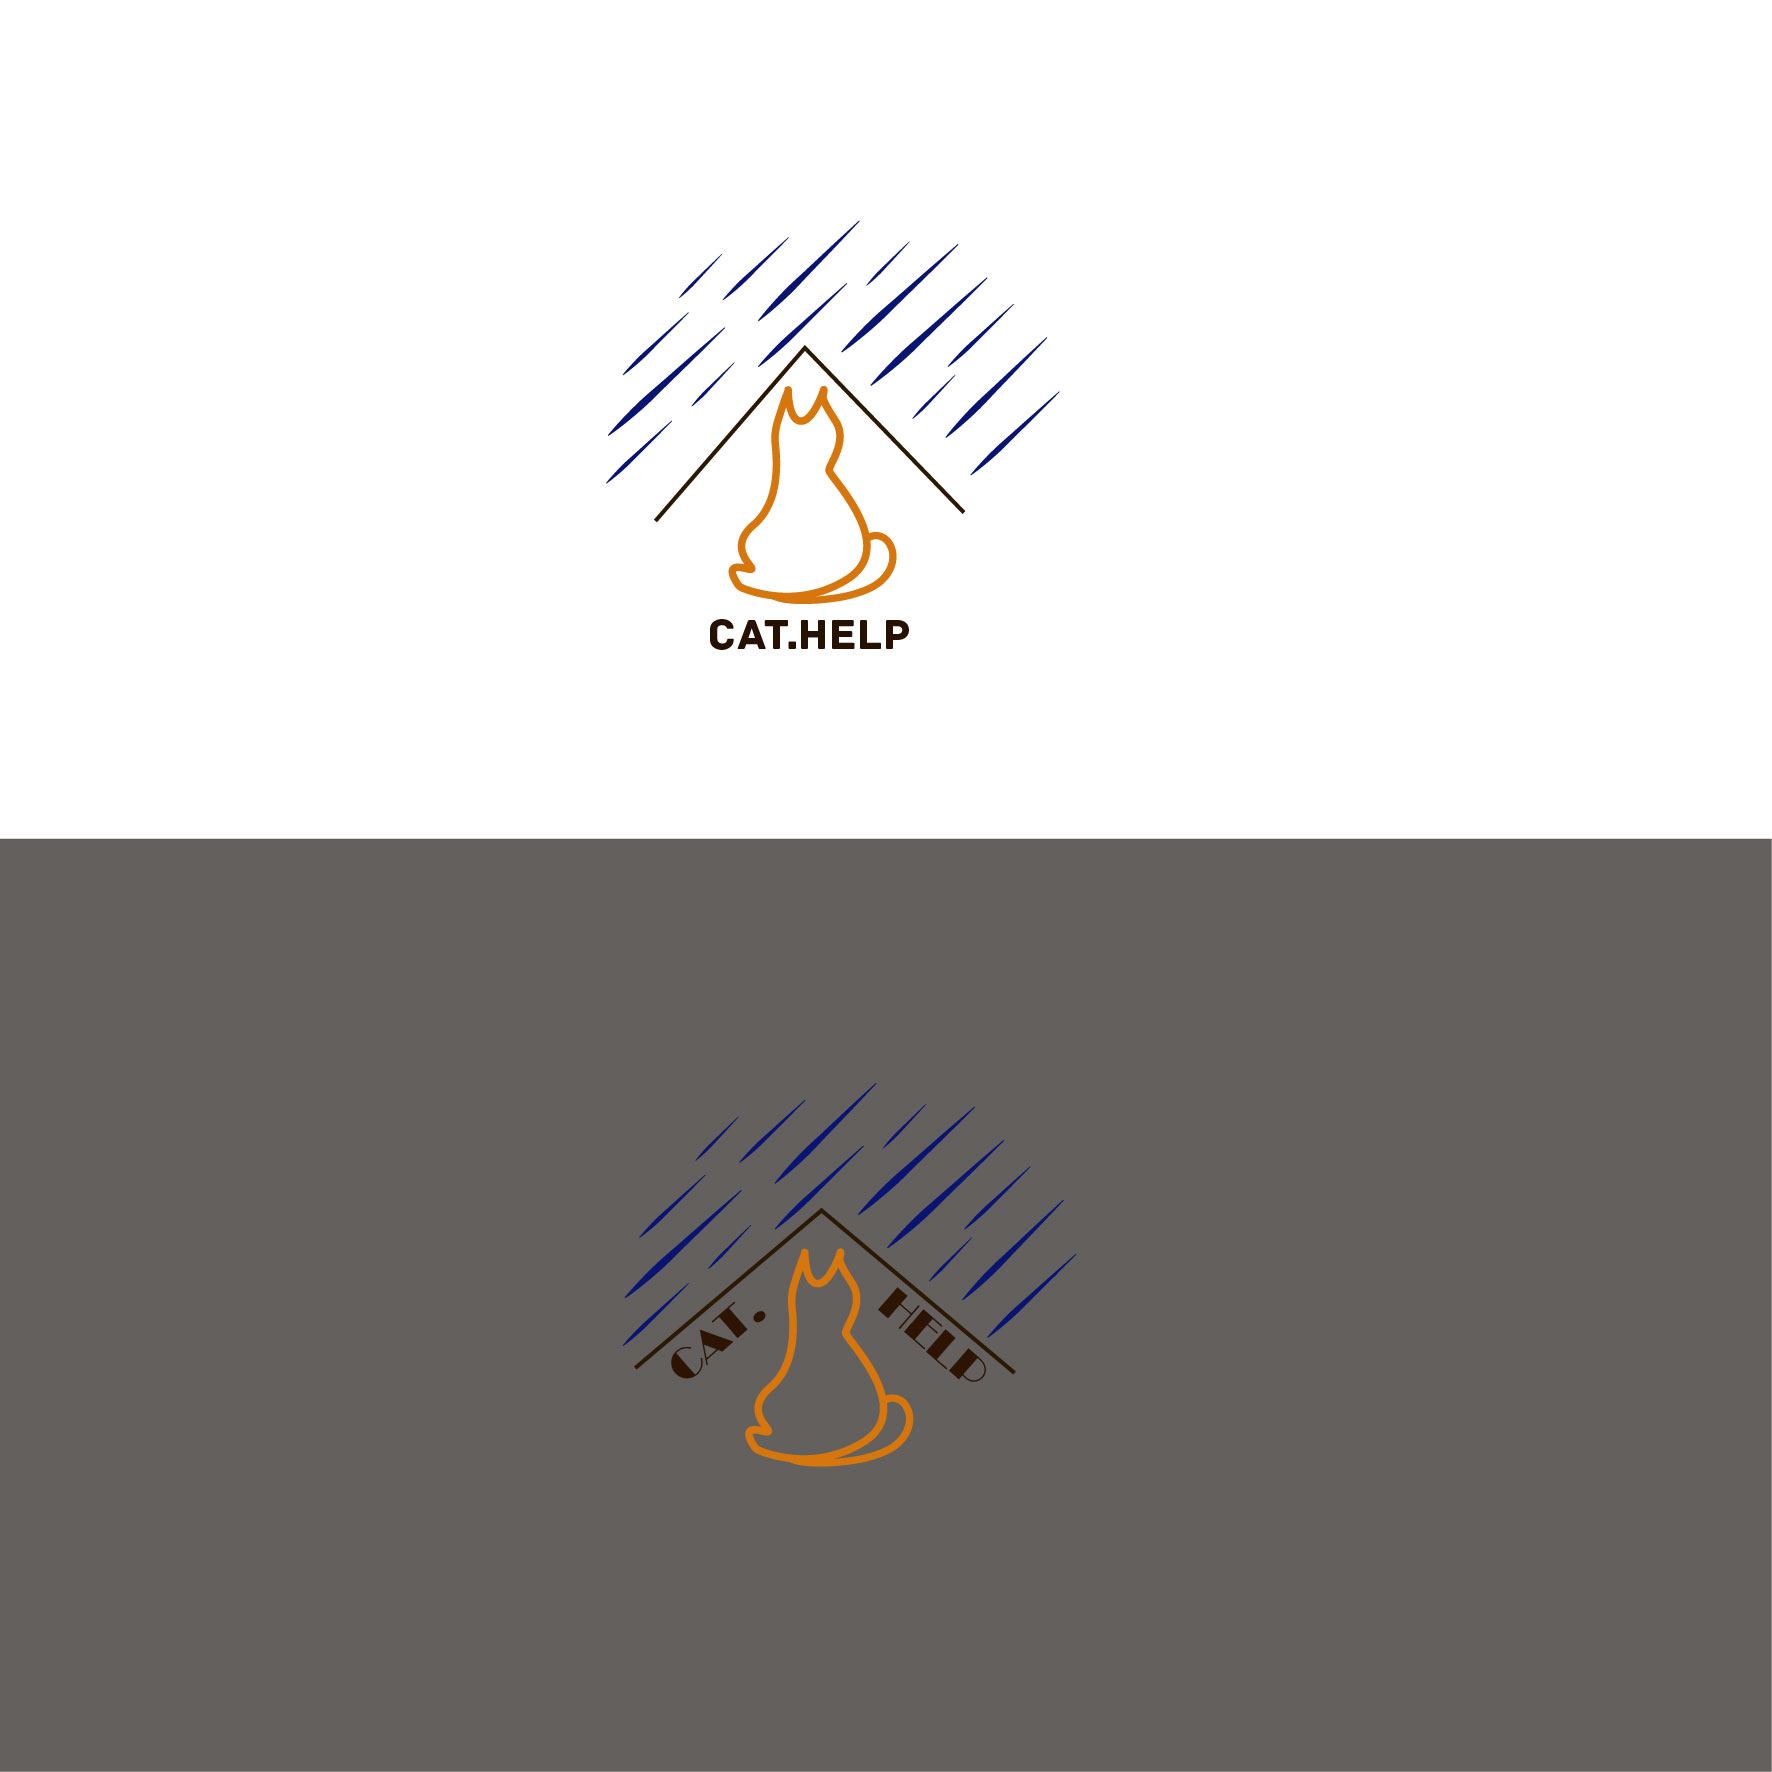 логотип для сайта и группы вк - cat.help фото f_78459dbc151b8ccf.jpg